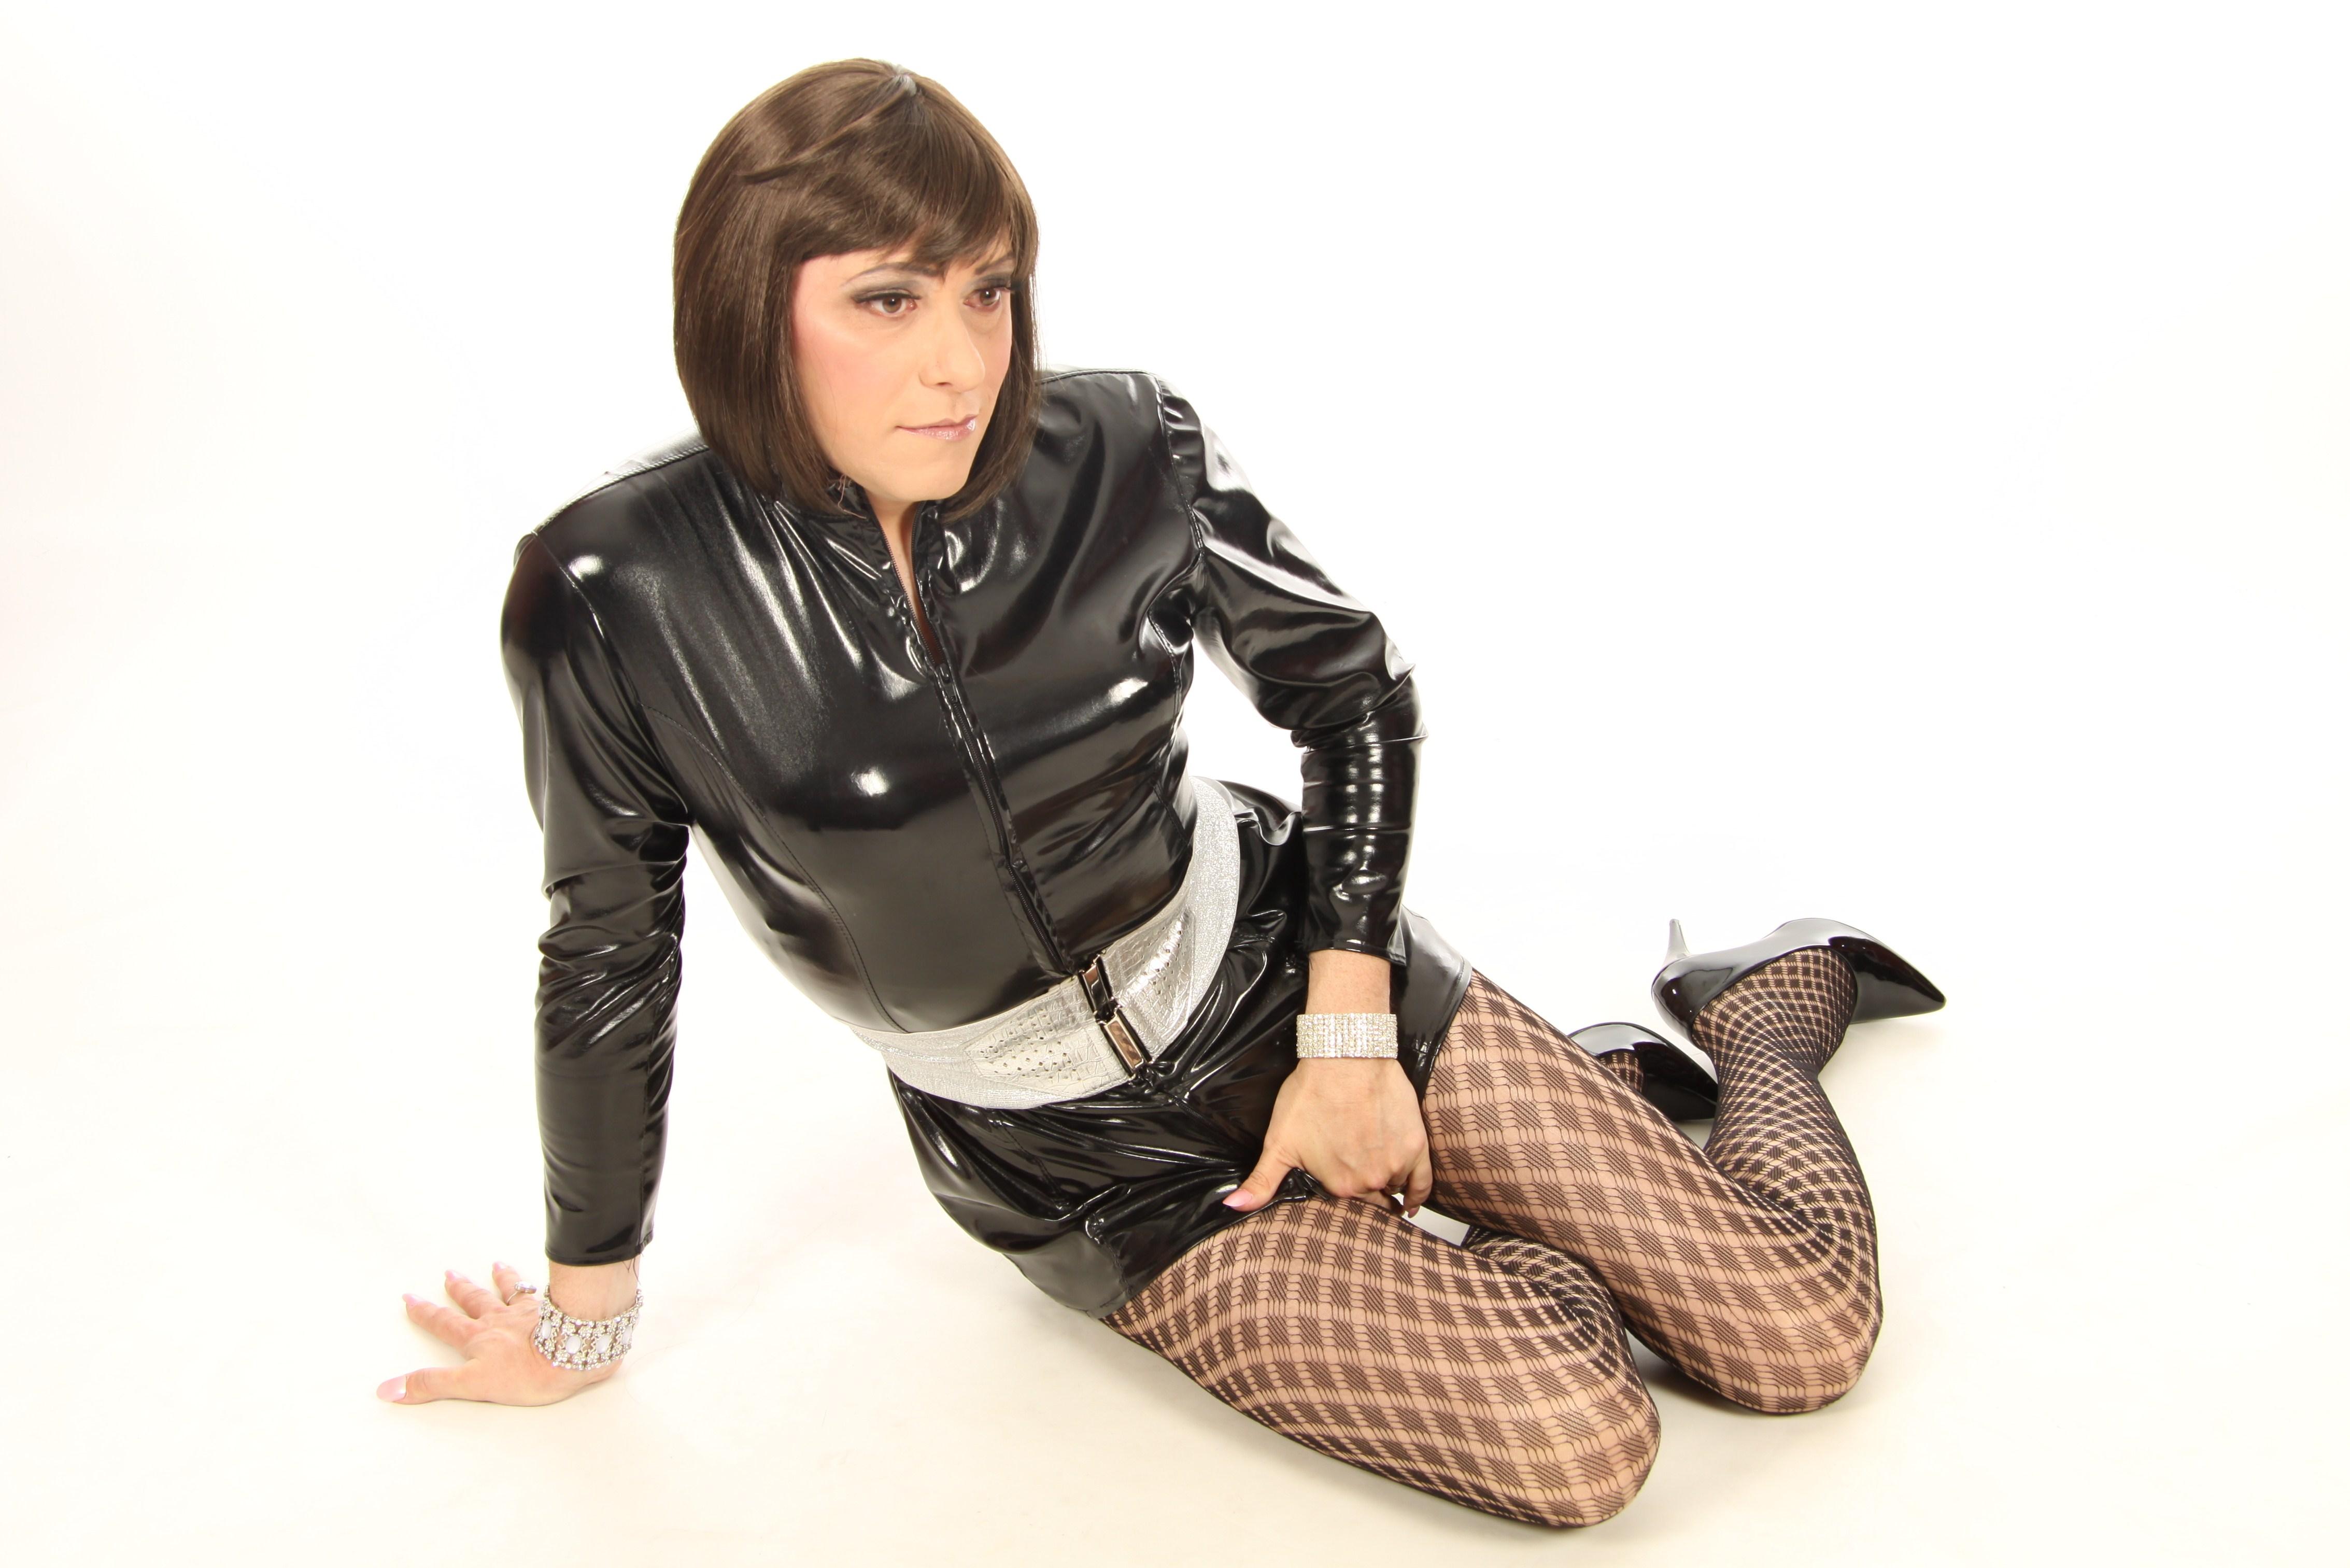 Celeste Protagonist Confirmed As Transgender By The Game's Creator